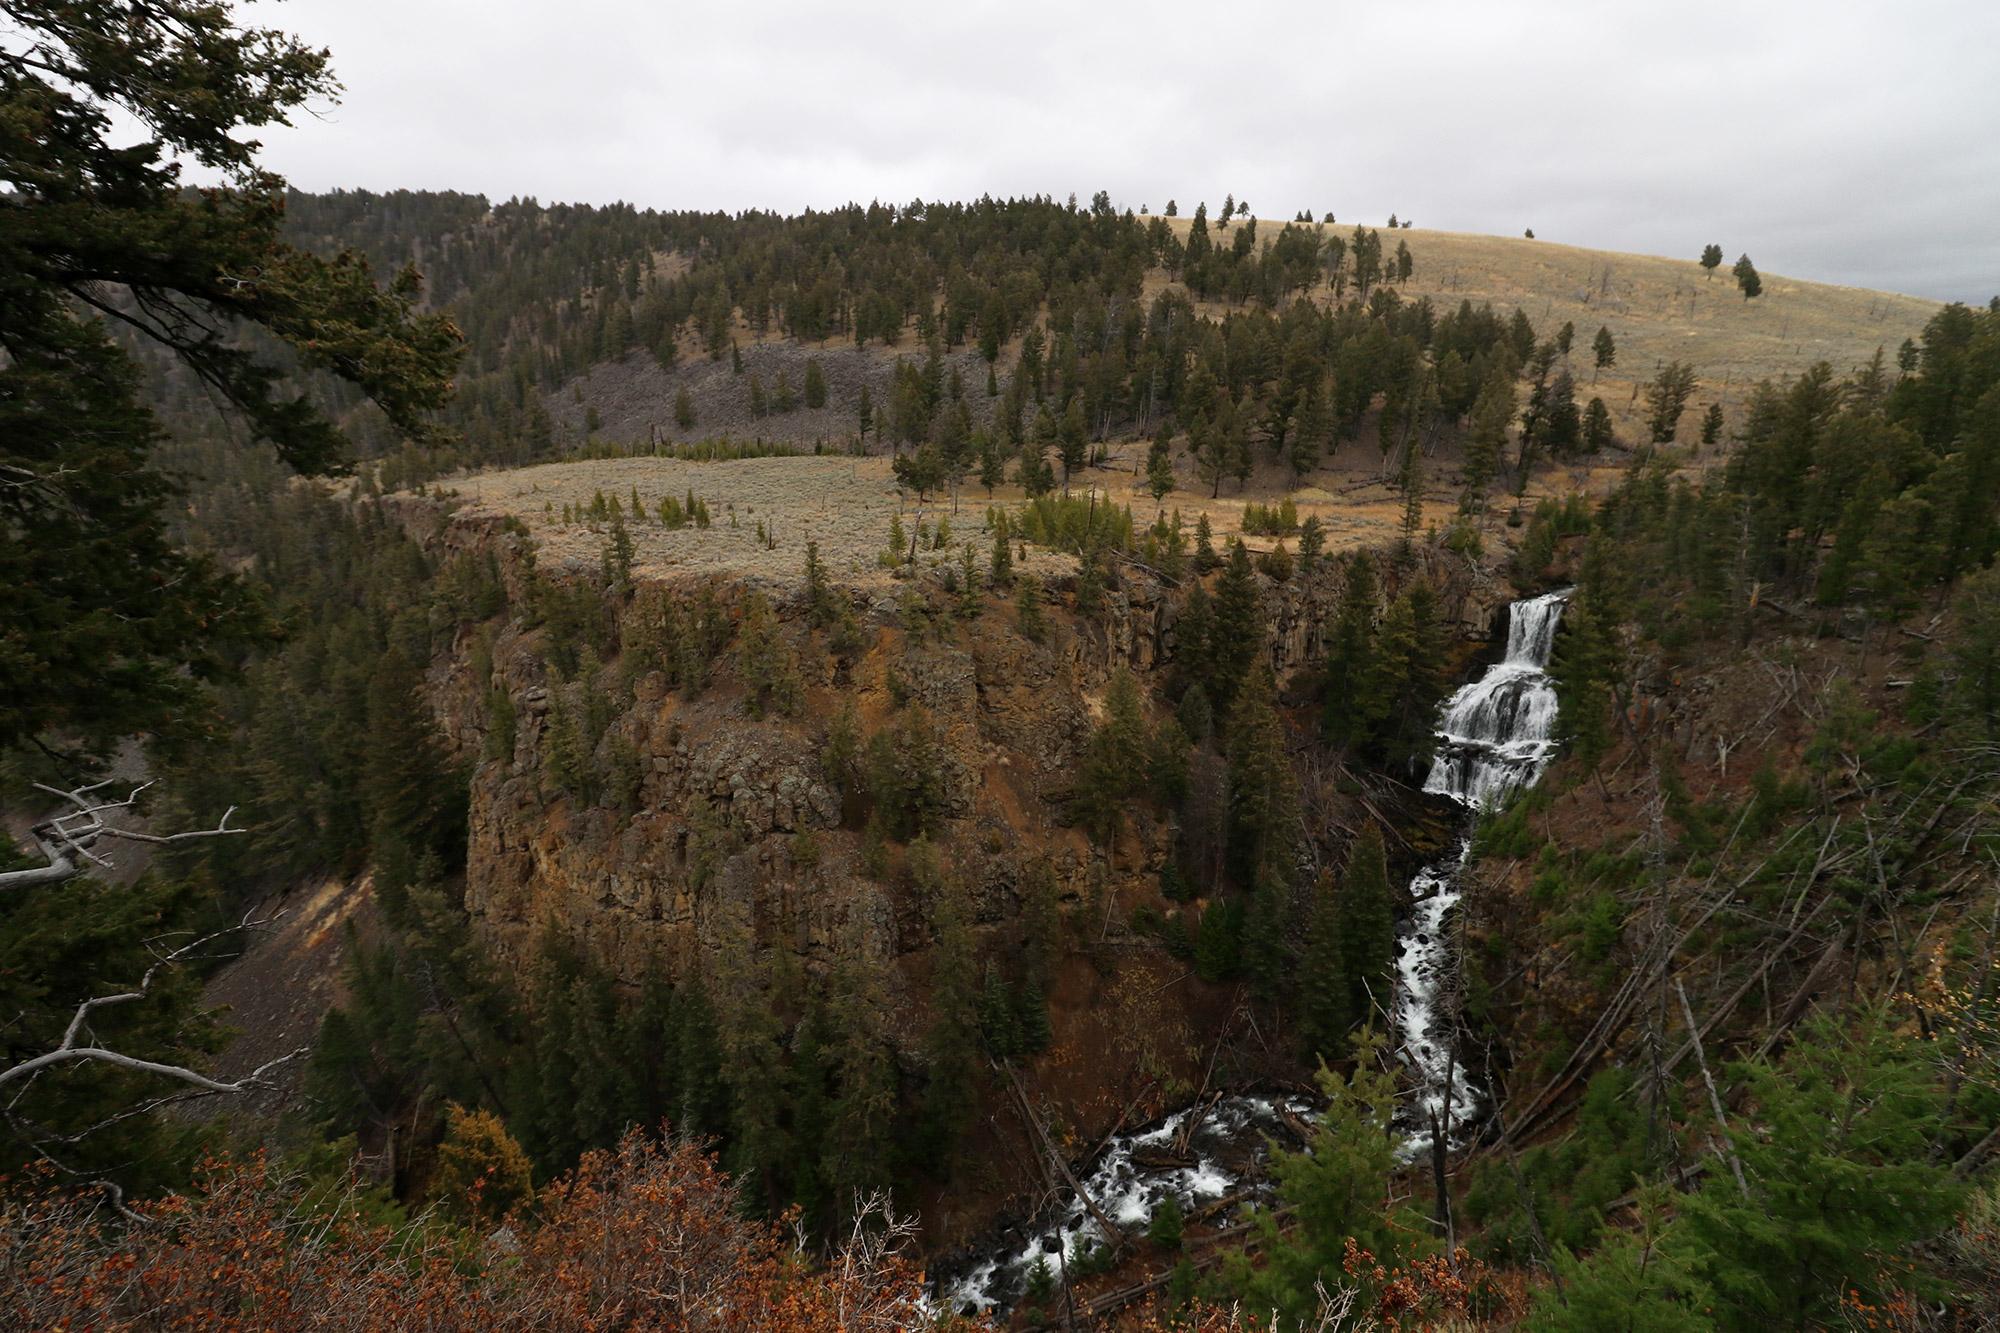 Amerika dag 4 - Yellowstone National Park - Undine Falls